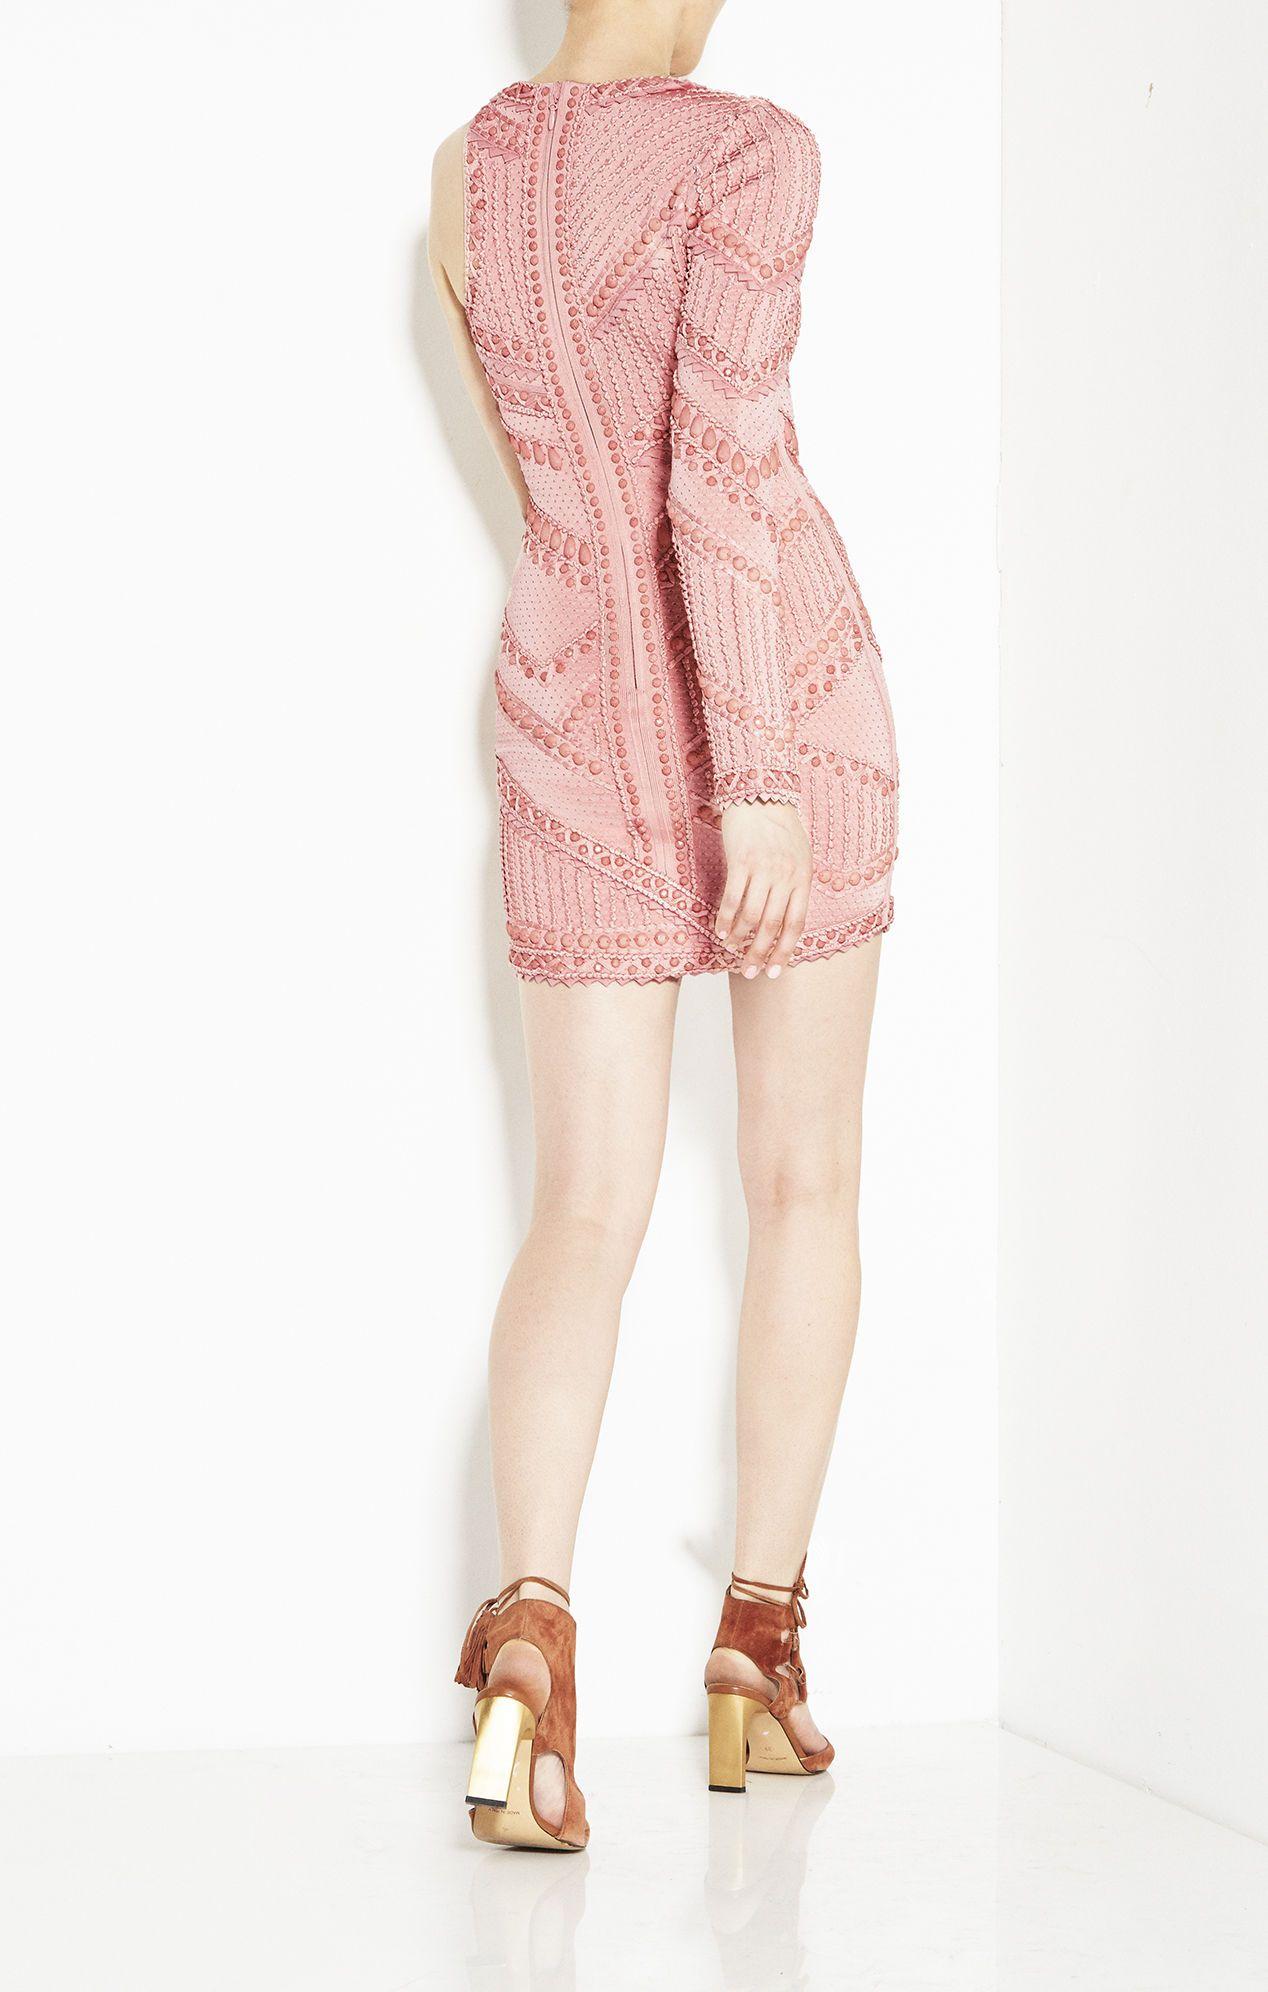 Herveleger amelia origami bead knot detail dress high fashion